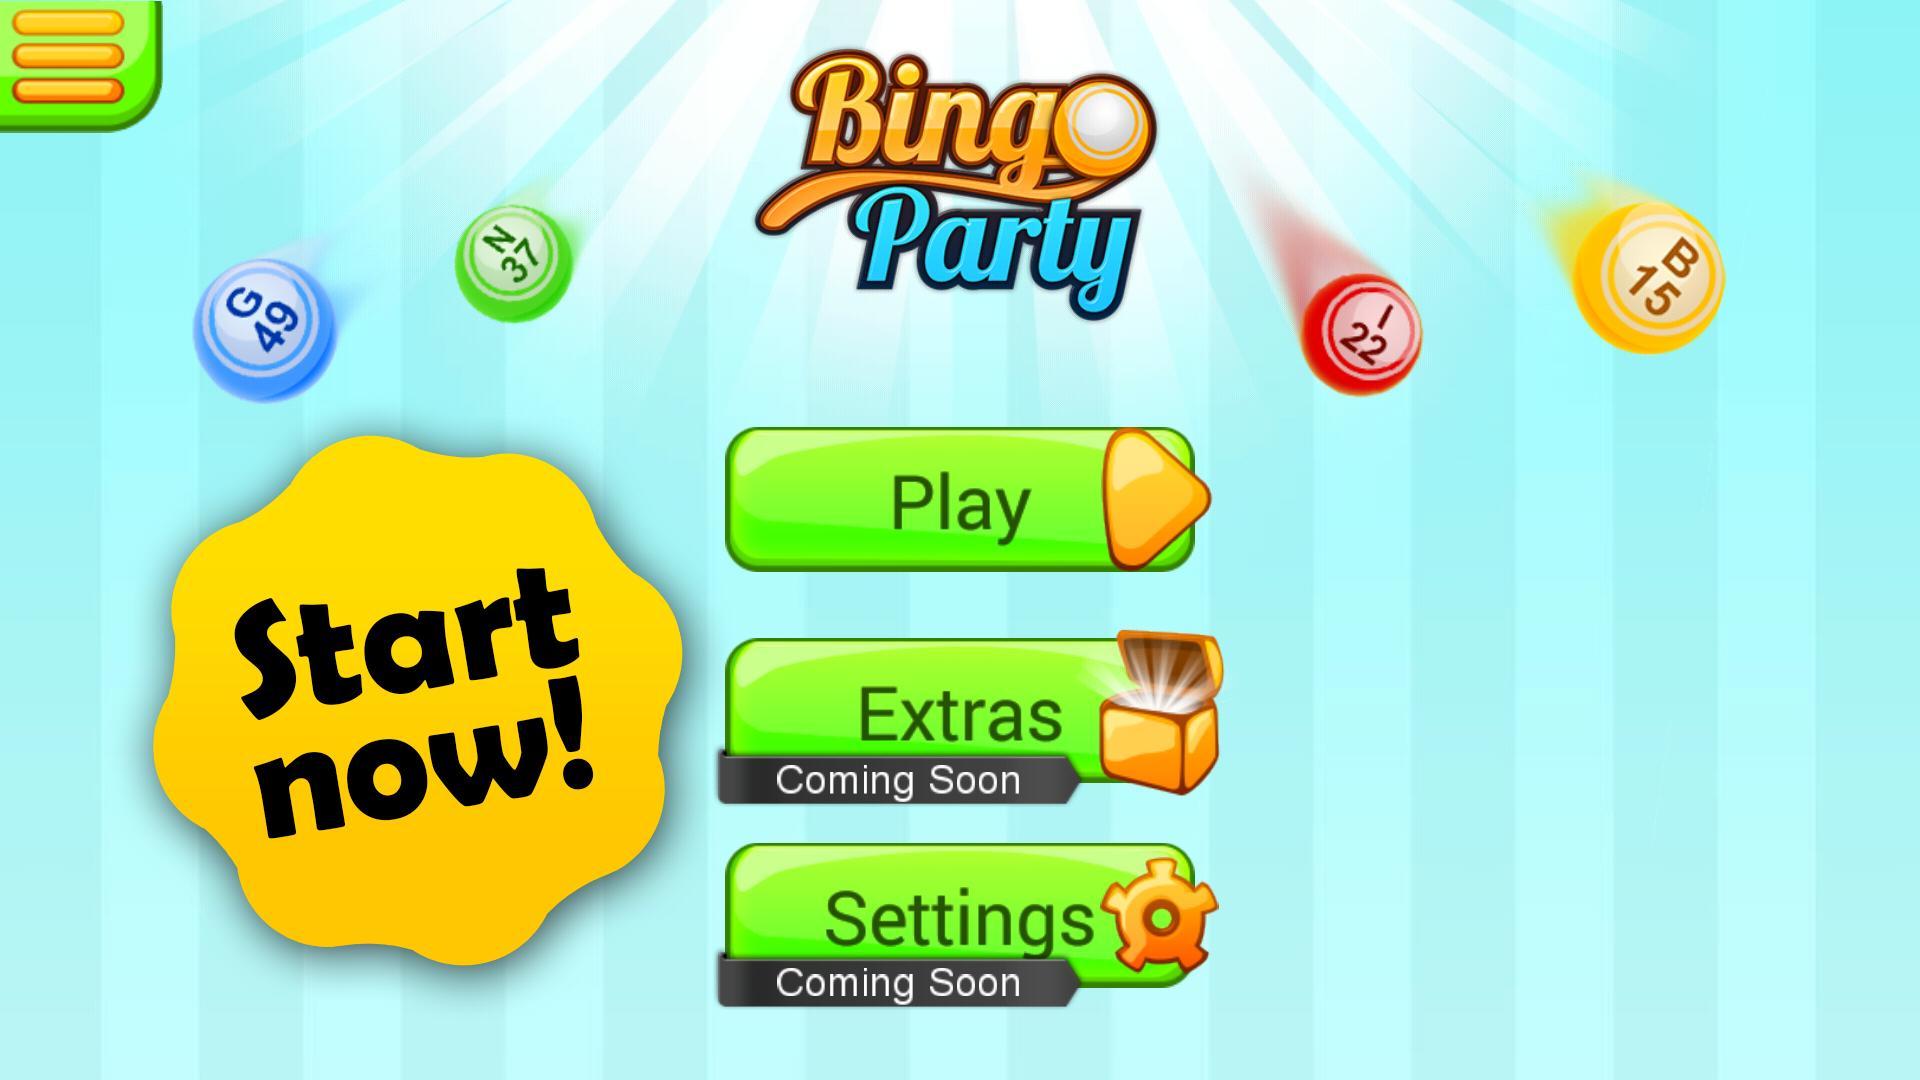 Bingo Party poster